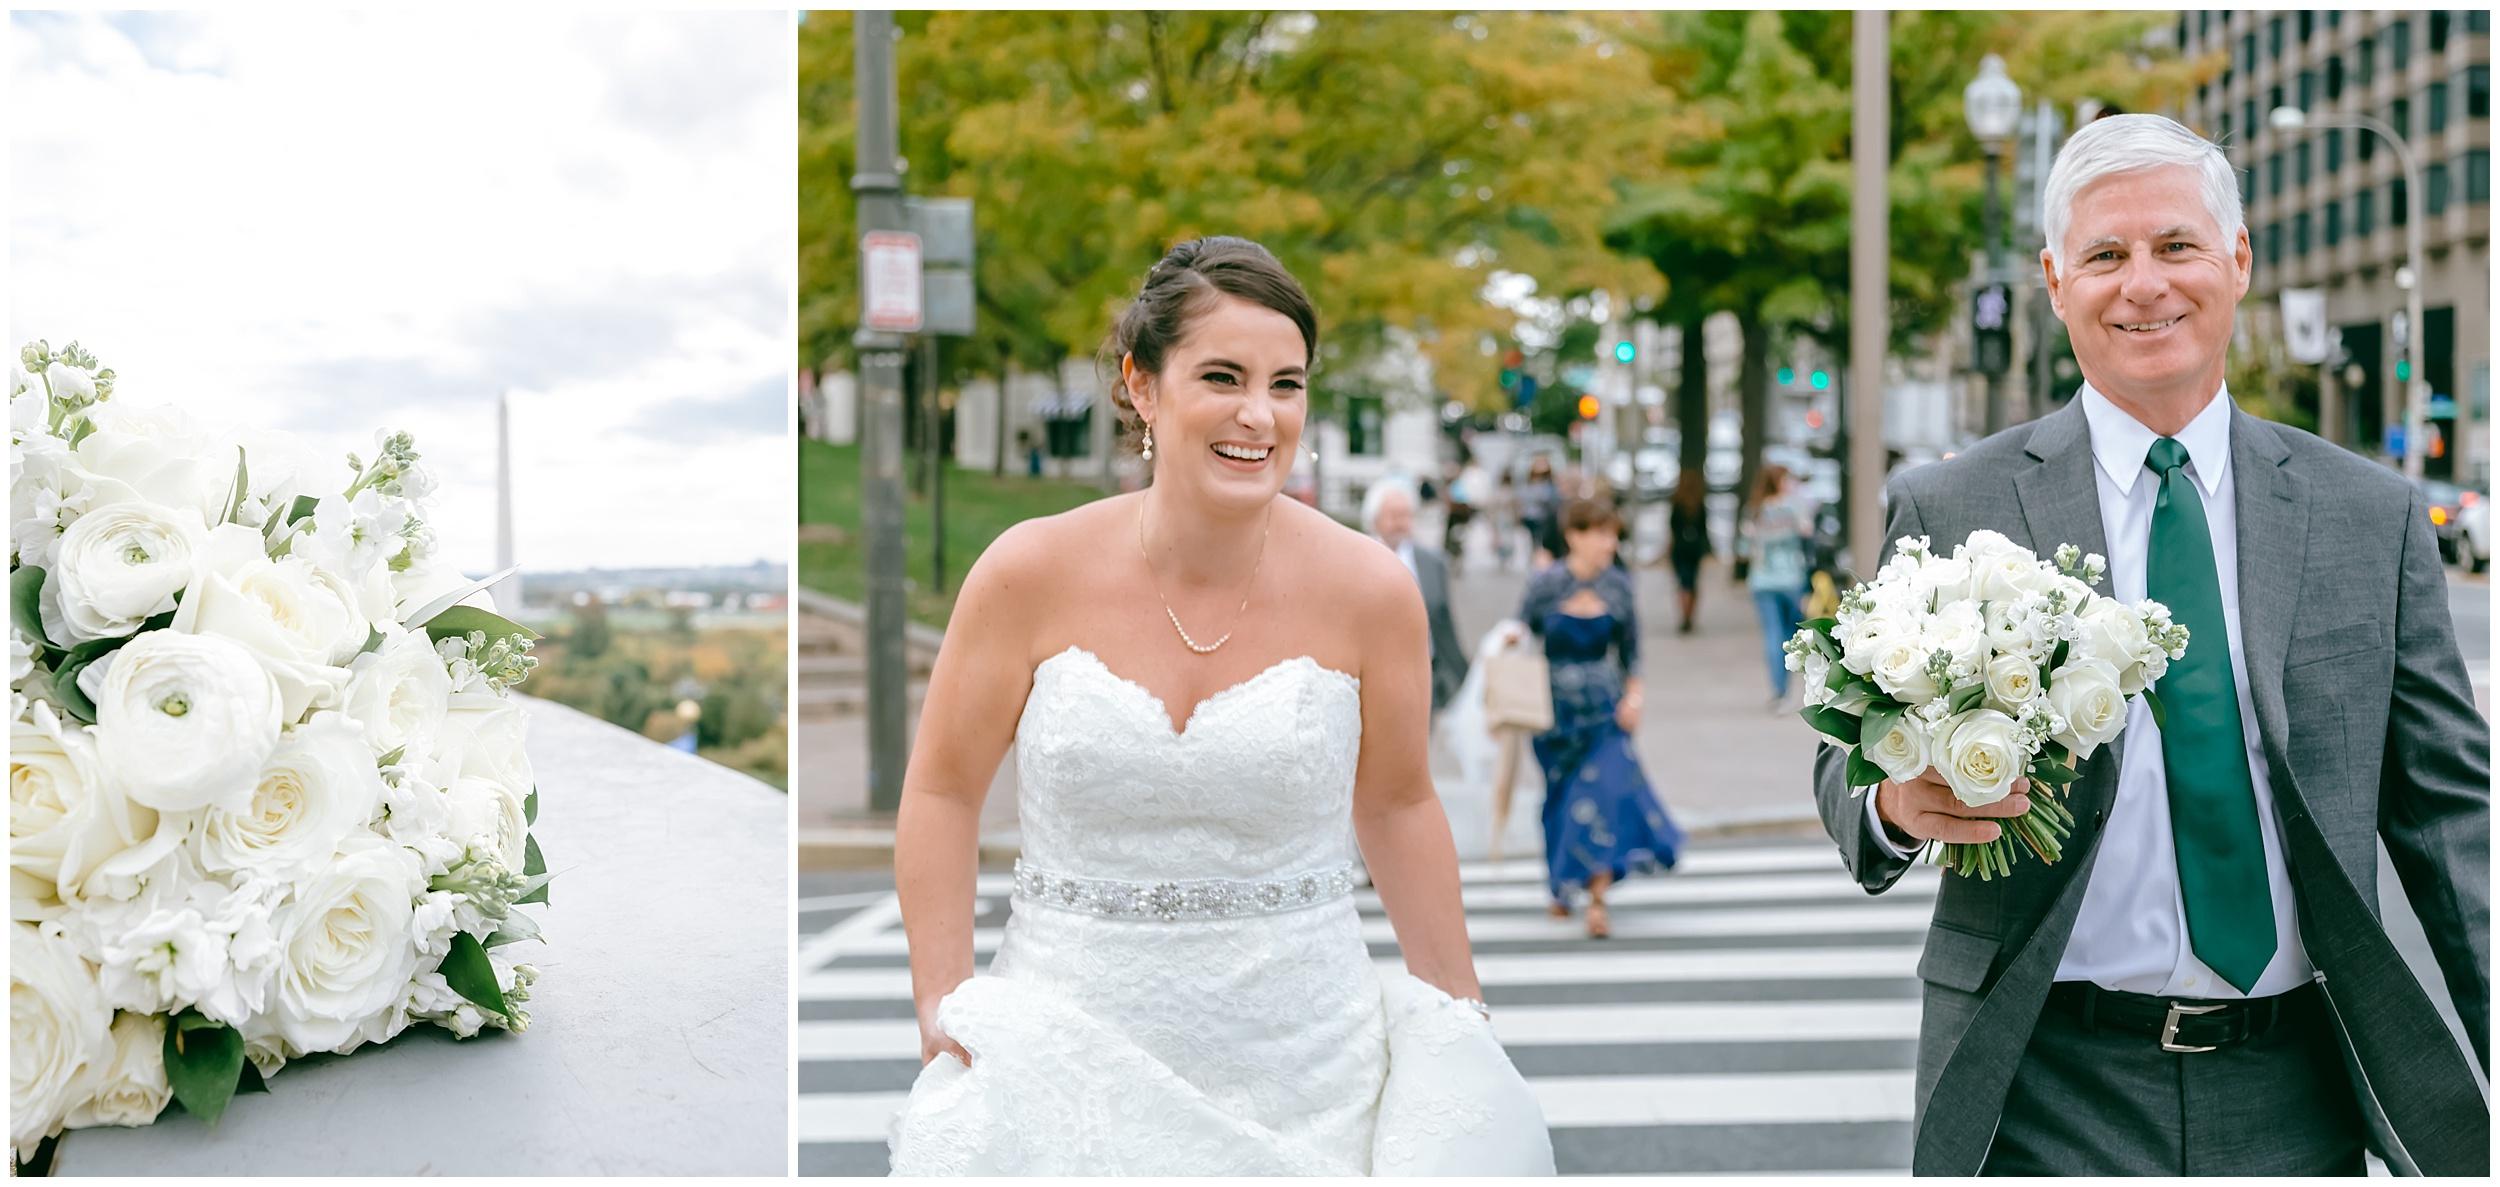 wedding-bride-father-bouquet-crosswalk-walking-washington-dc-photographer